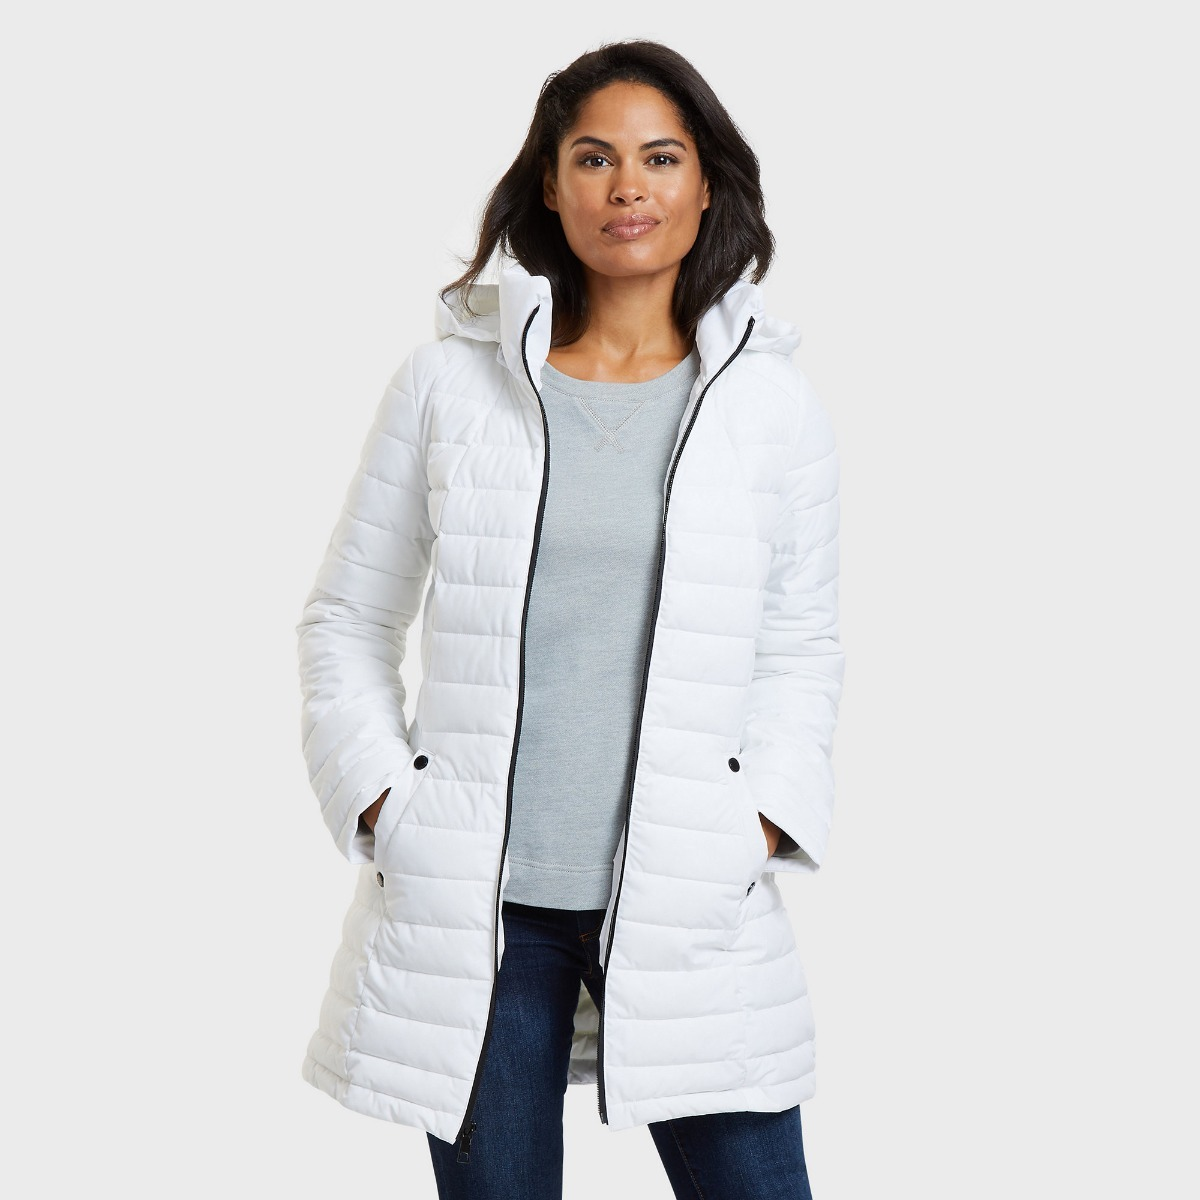 445d00adbf9 chamarra chaqueta nautica mujer frio impermeable lluvia zip. Cargando zoom.